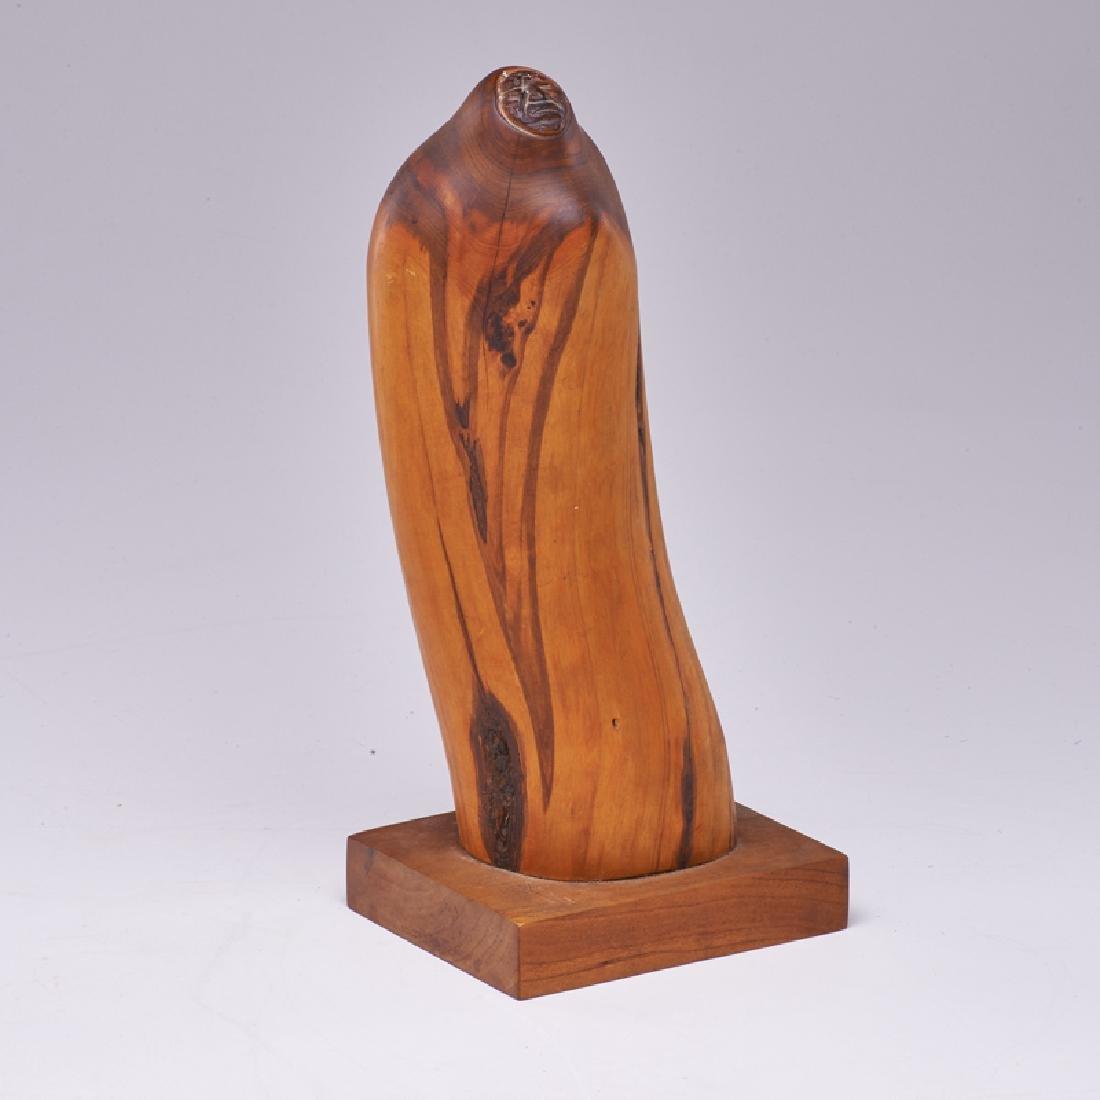 EARL EDER (Native American/Sioux, b. 1944)